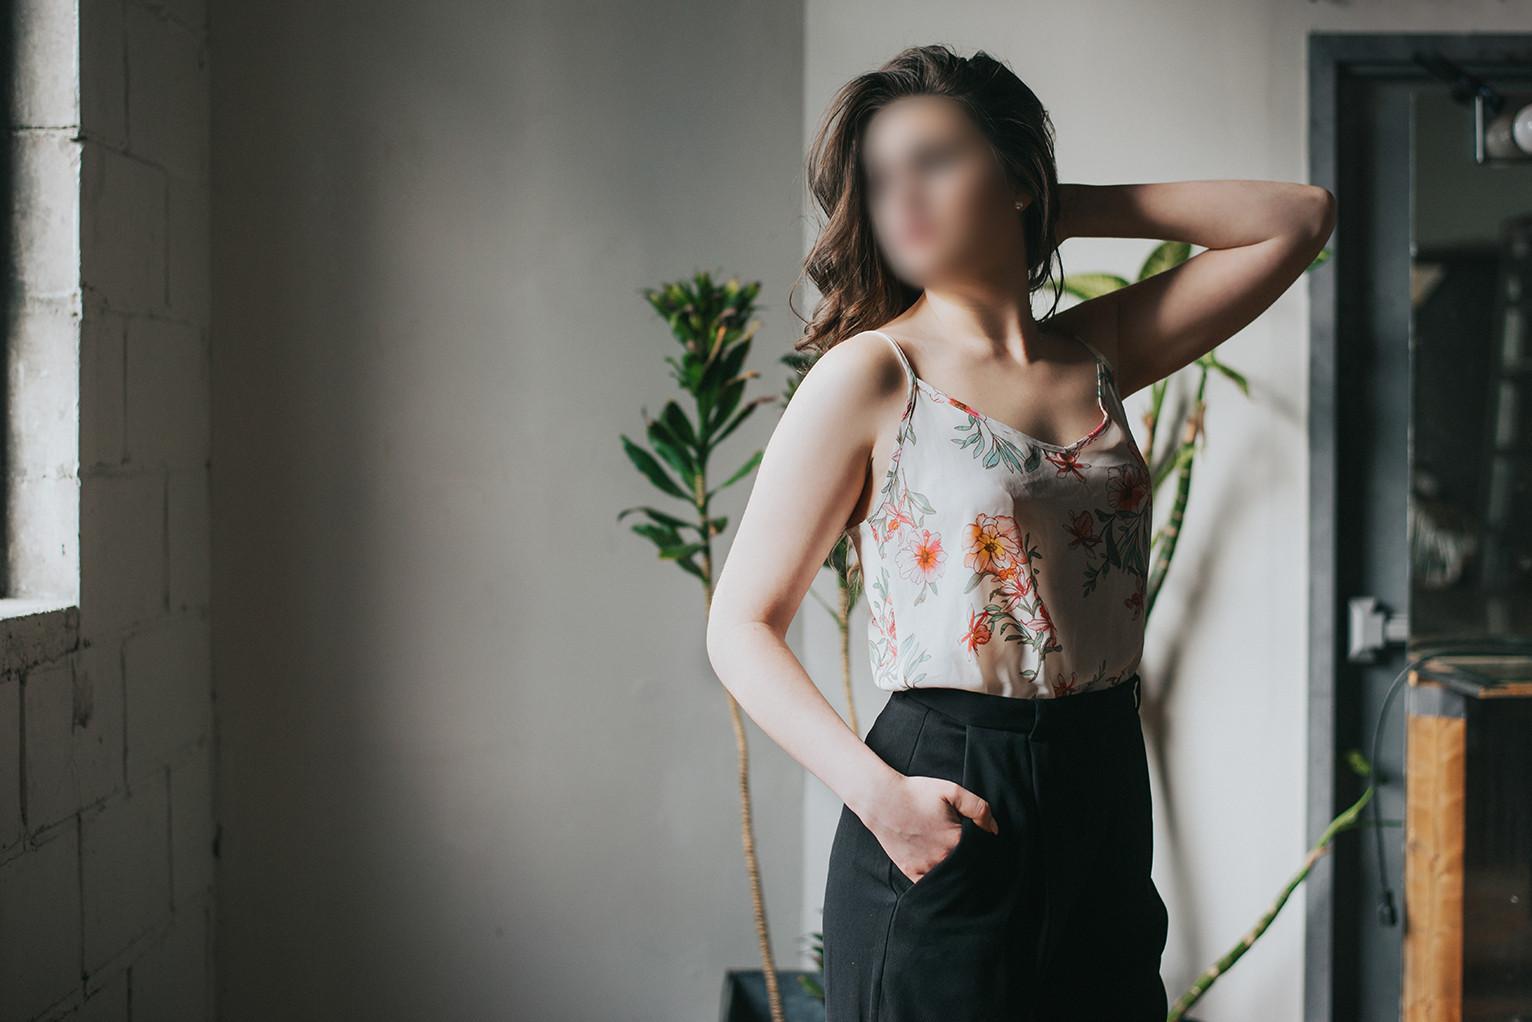 Mara-1.blur.jpg